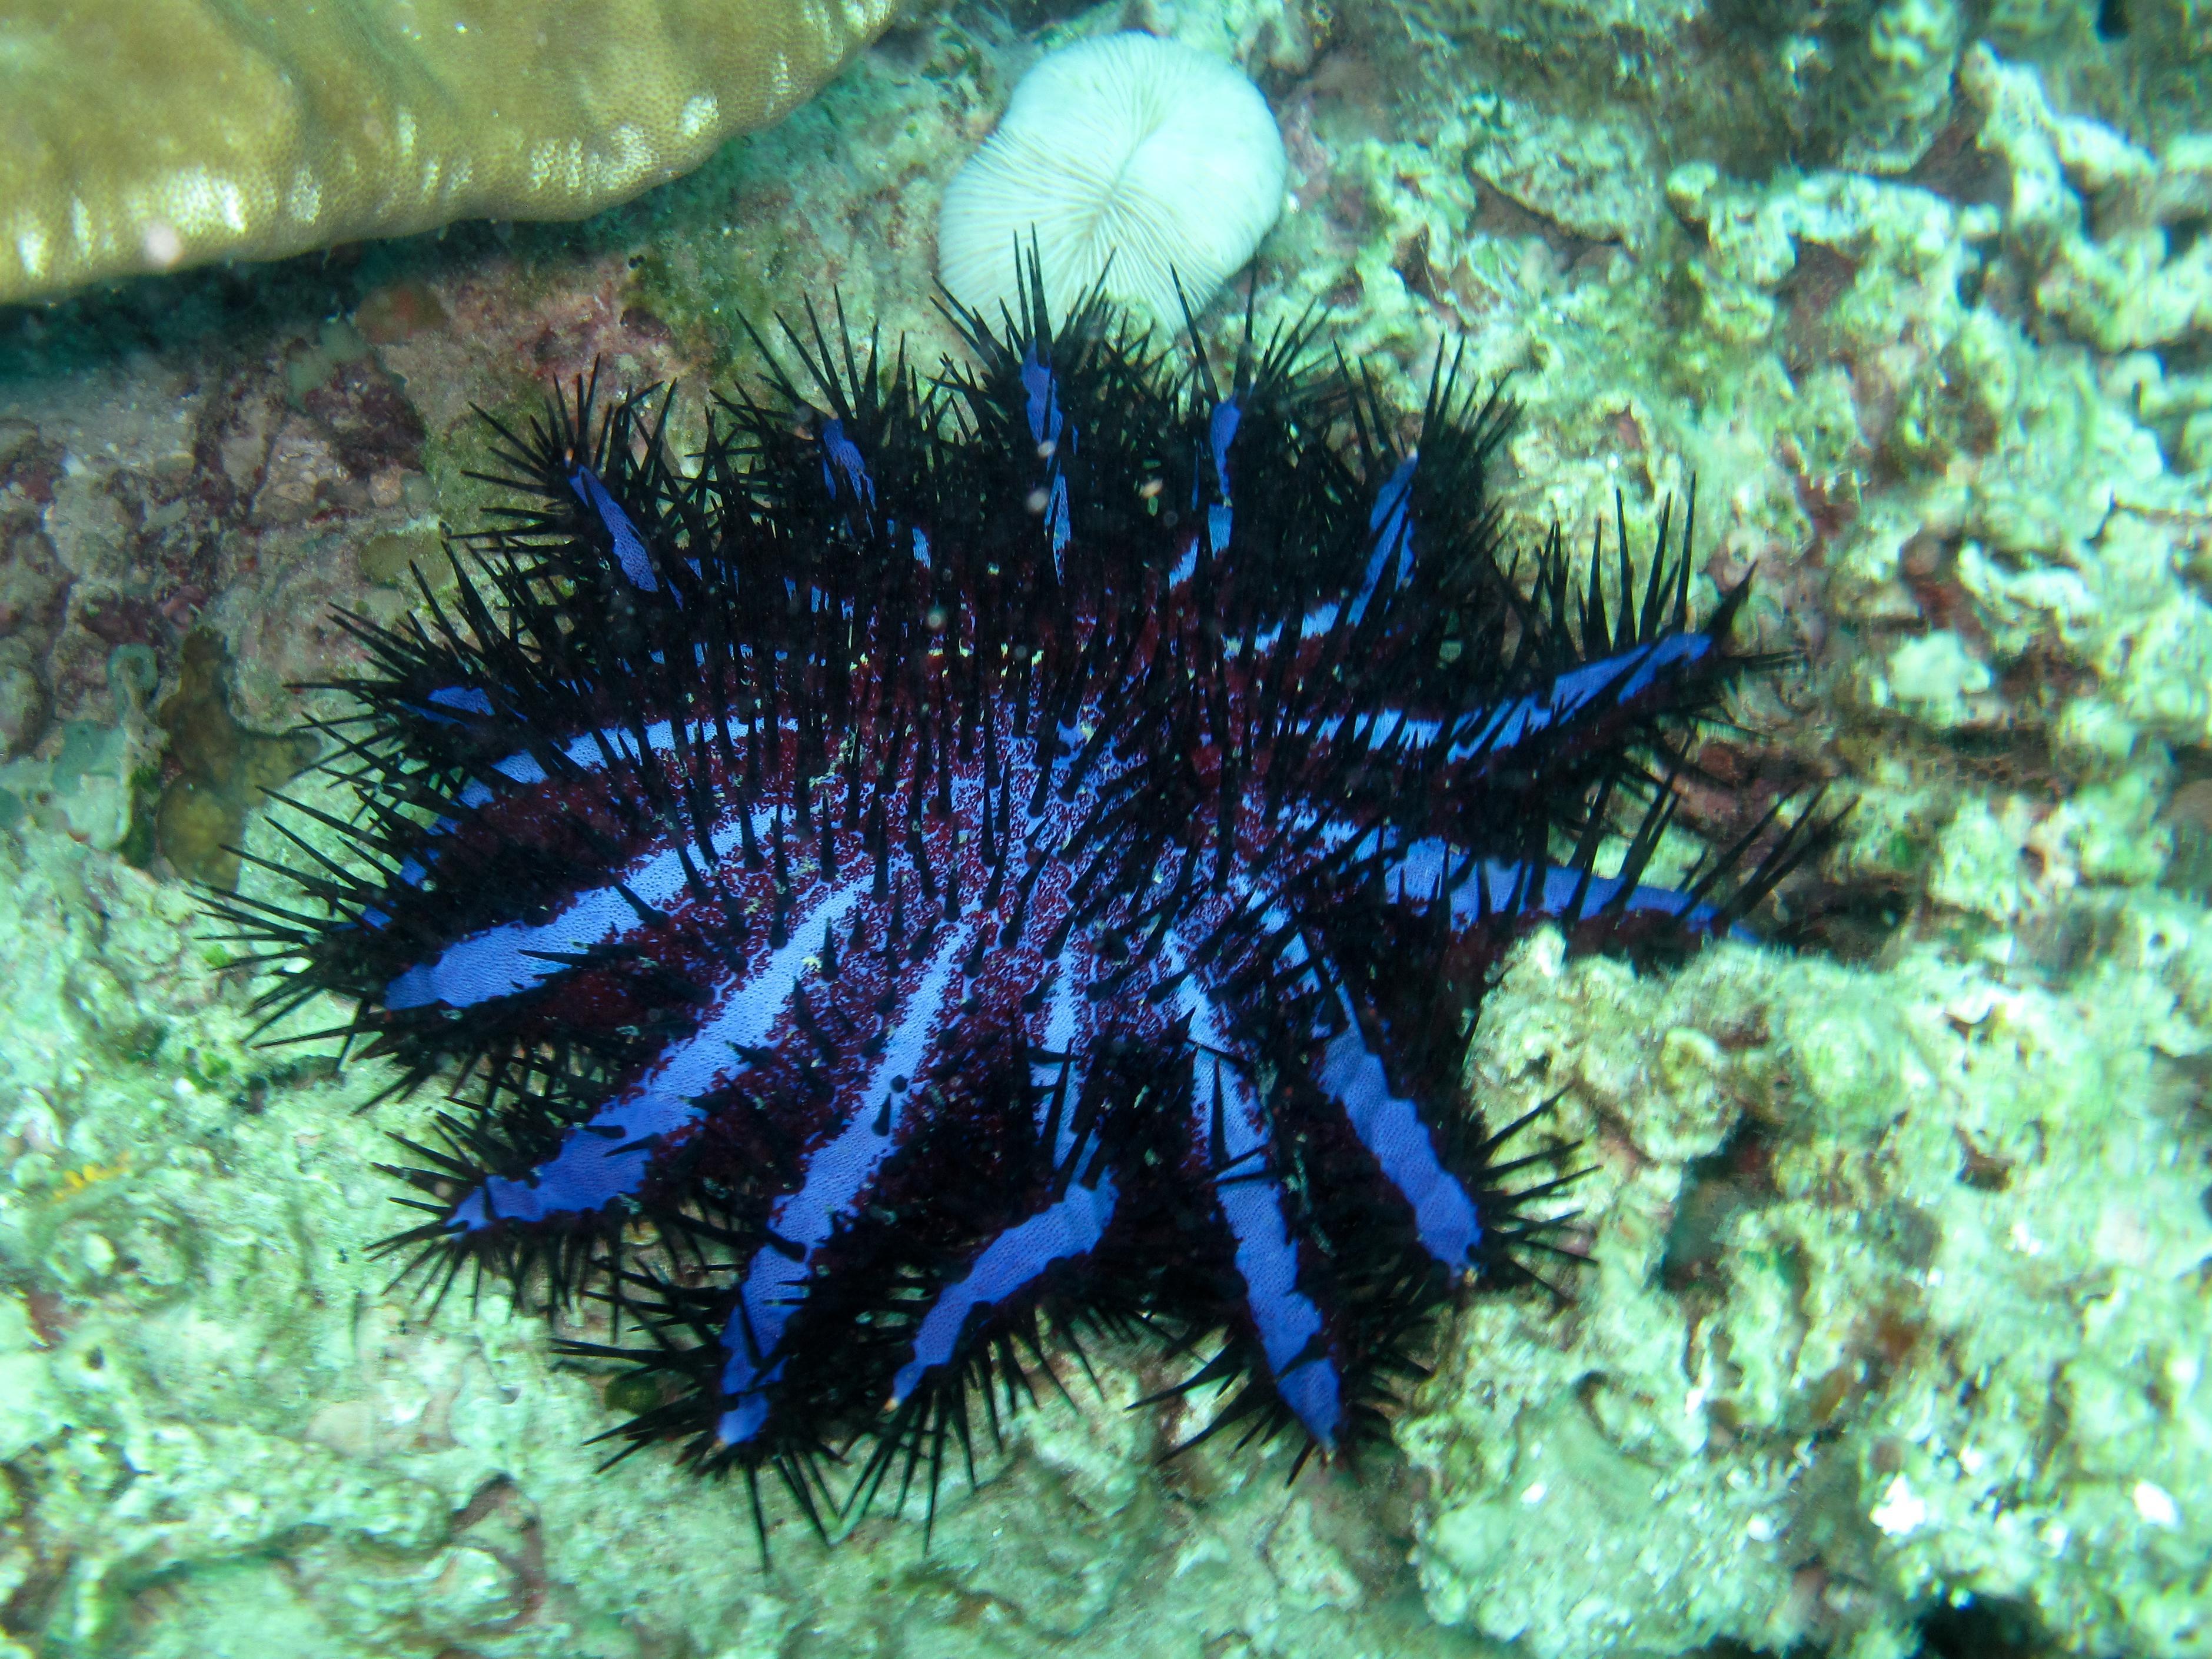 Coral Eating Starfish! - Paperblog